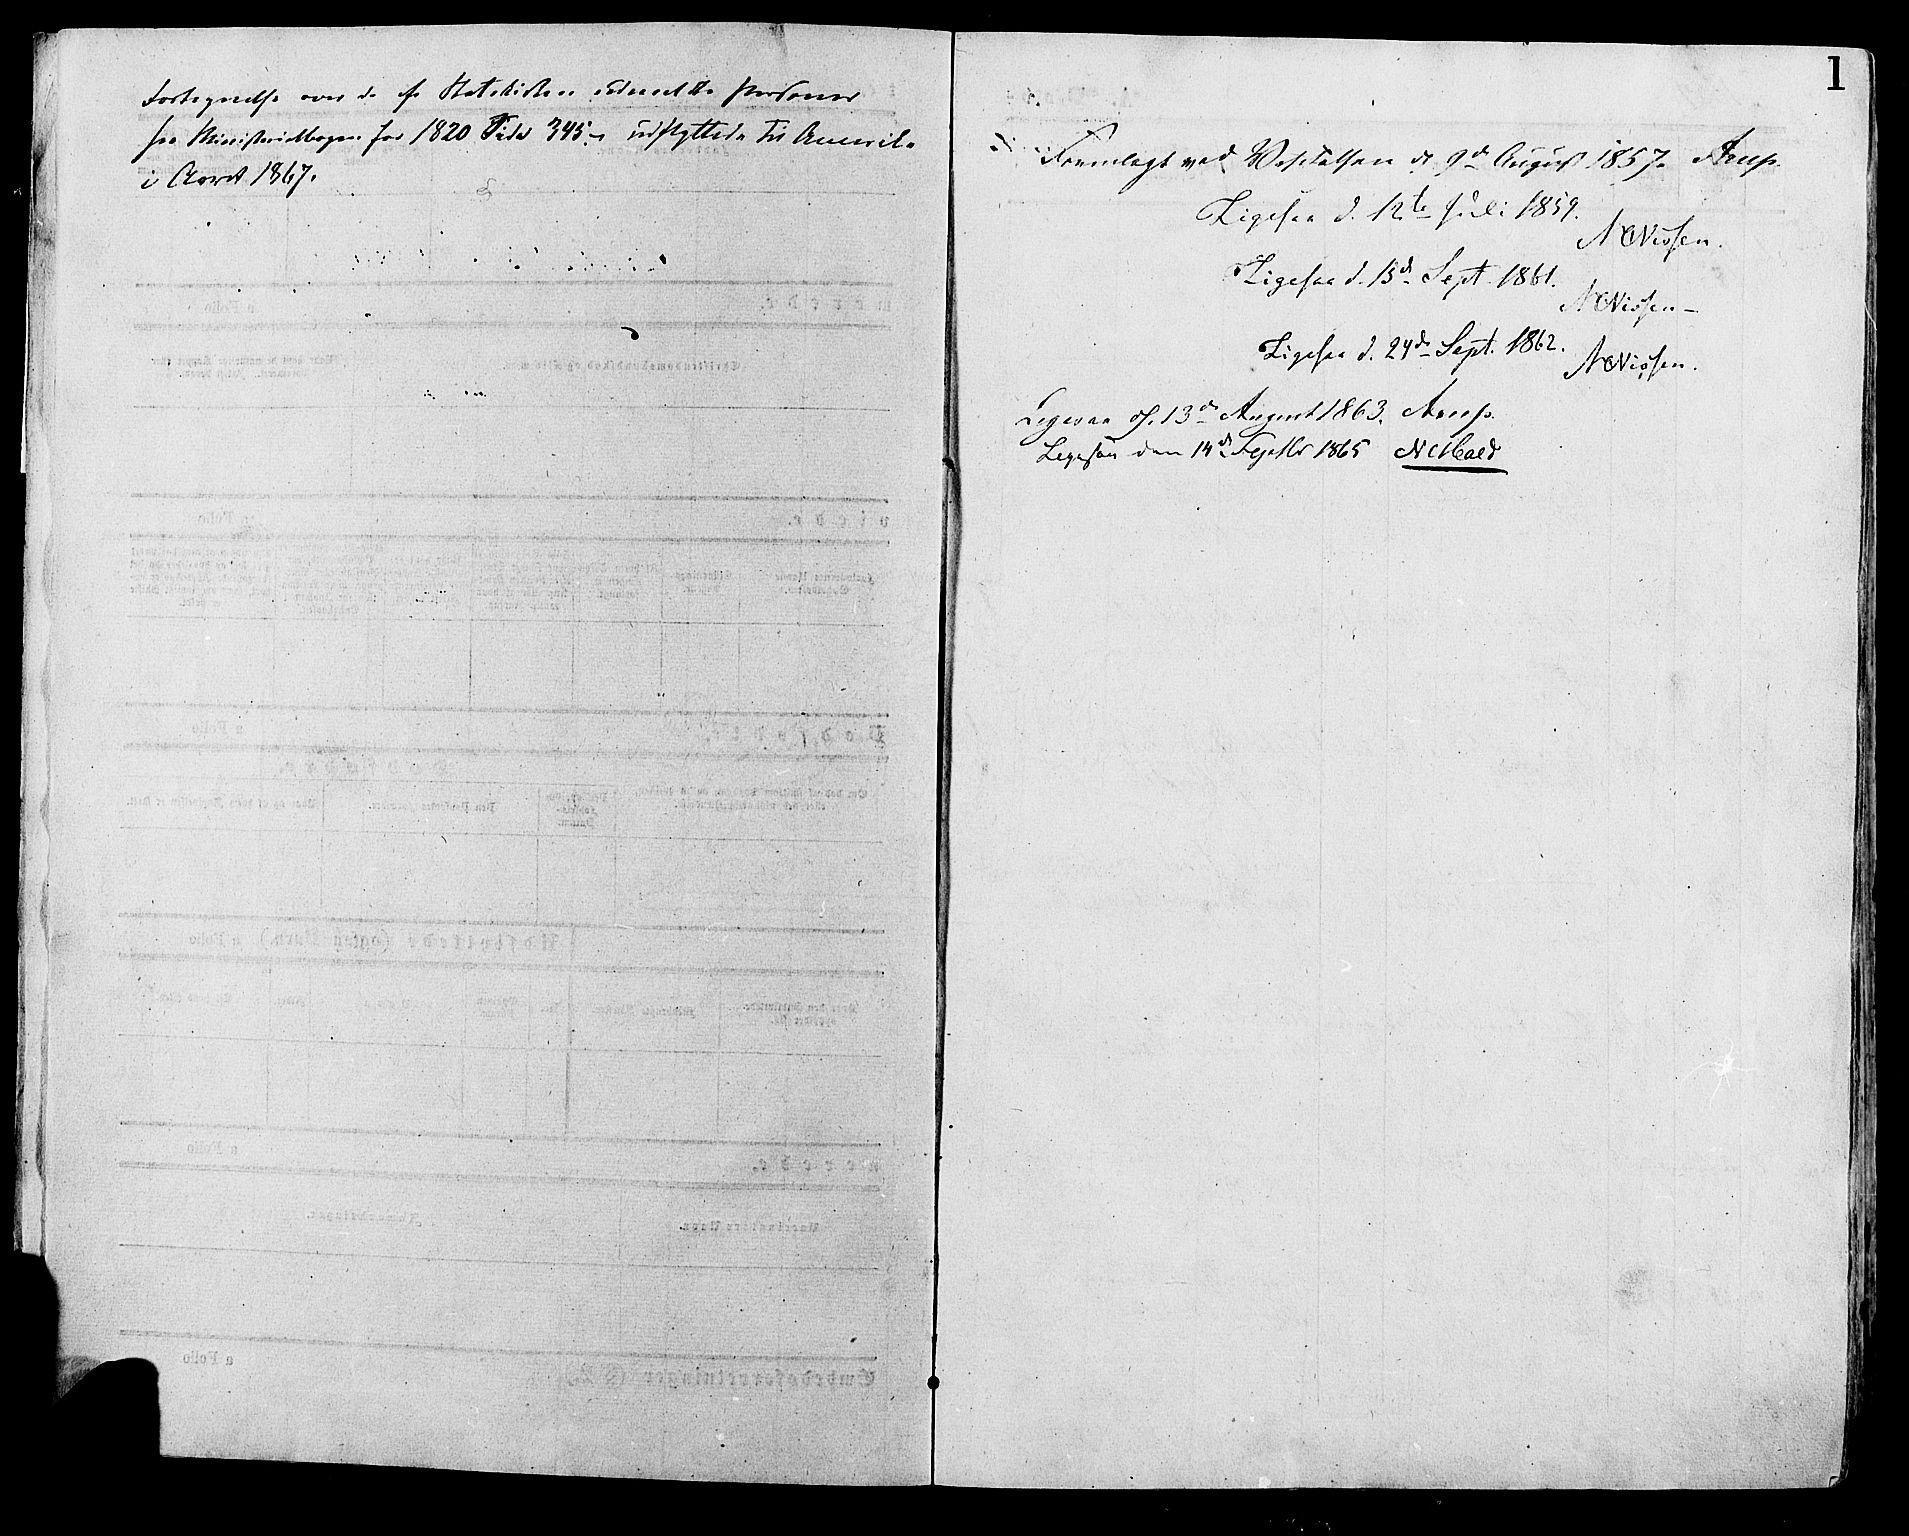 SAH, Lesja prestekontor, Ministerialbok nr. 8, 1854-1880, s. 1